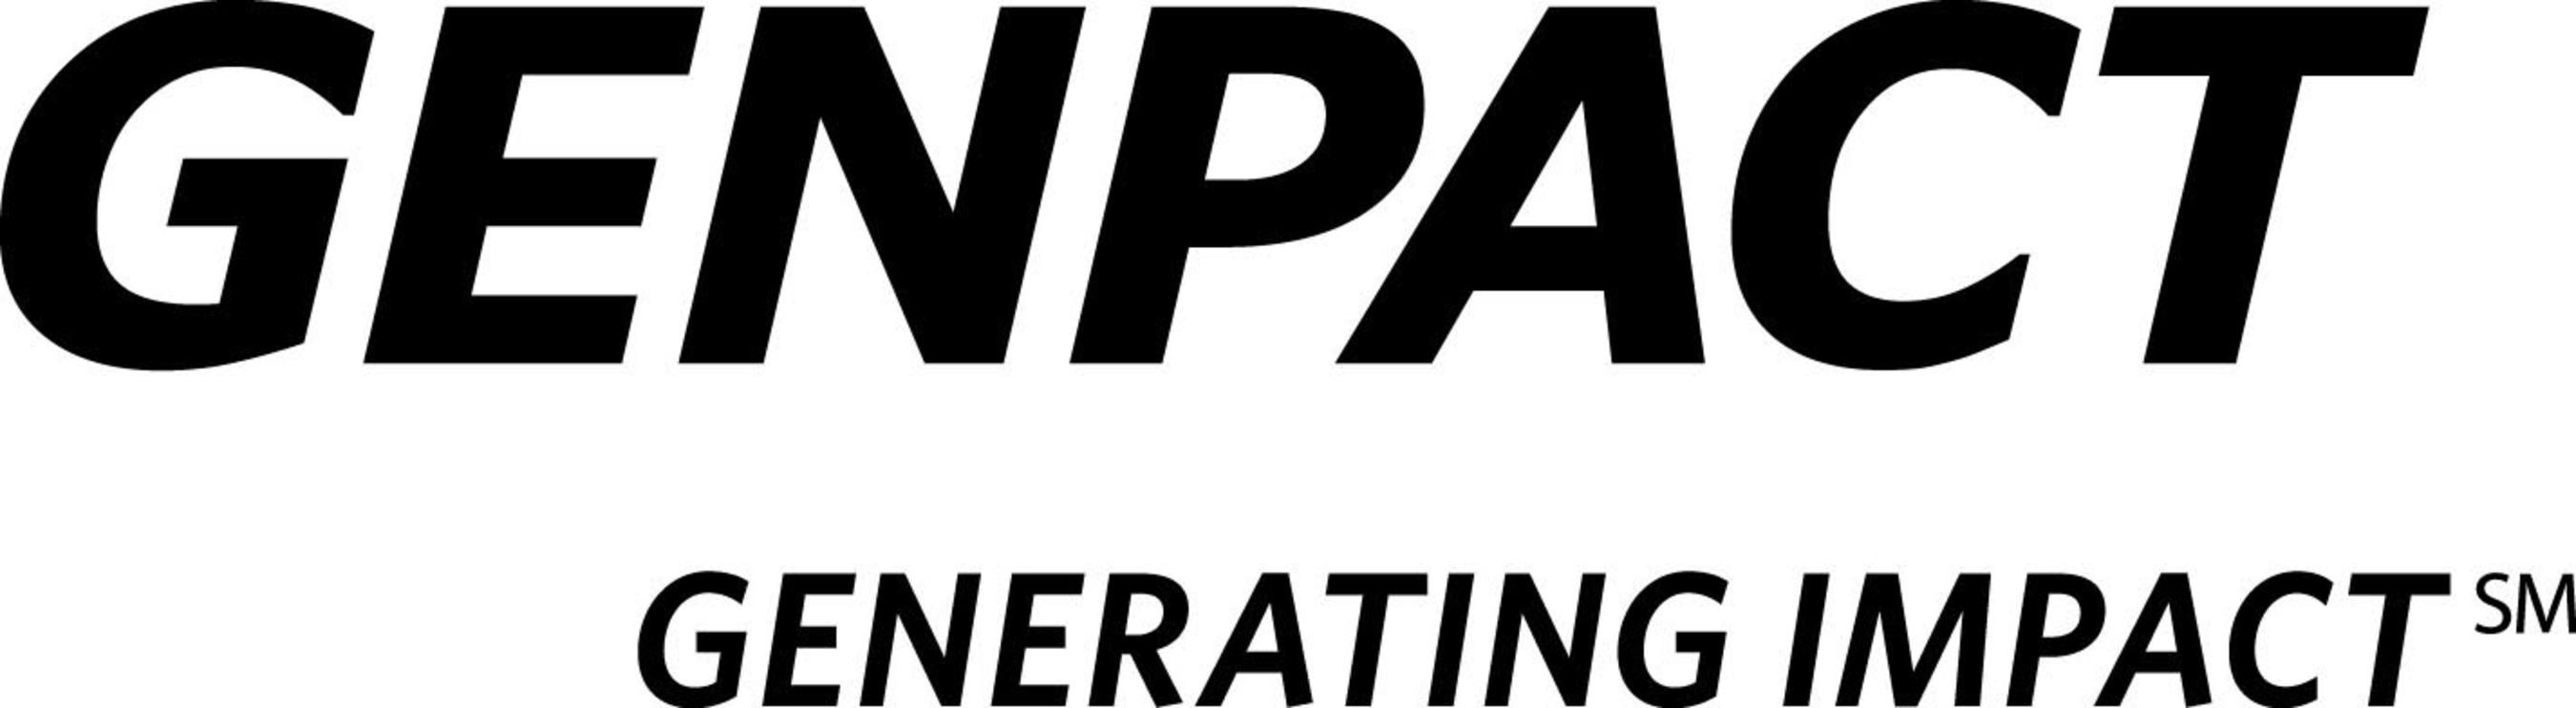 Genpact Limited Logo.